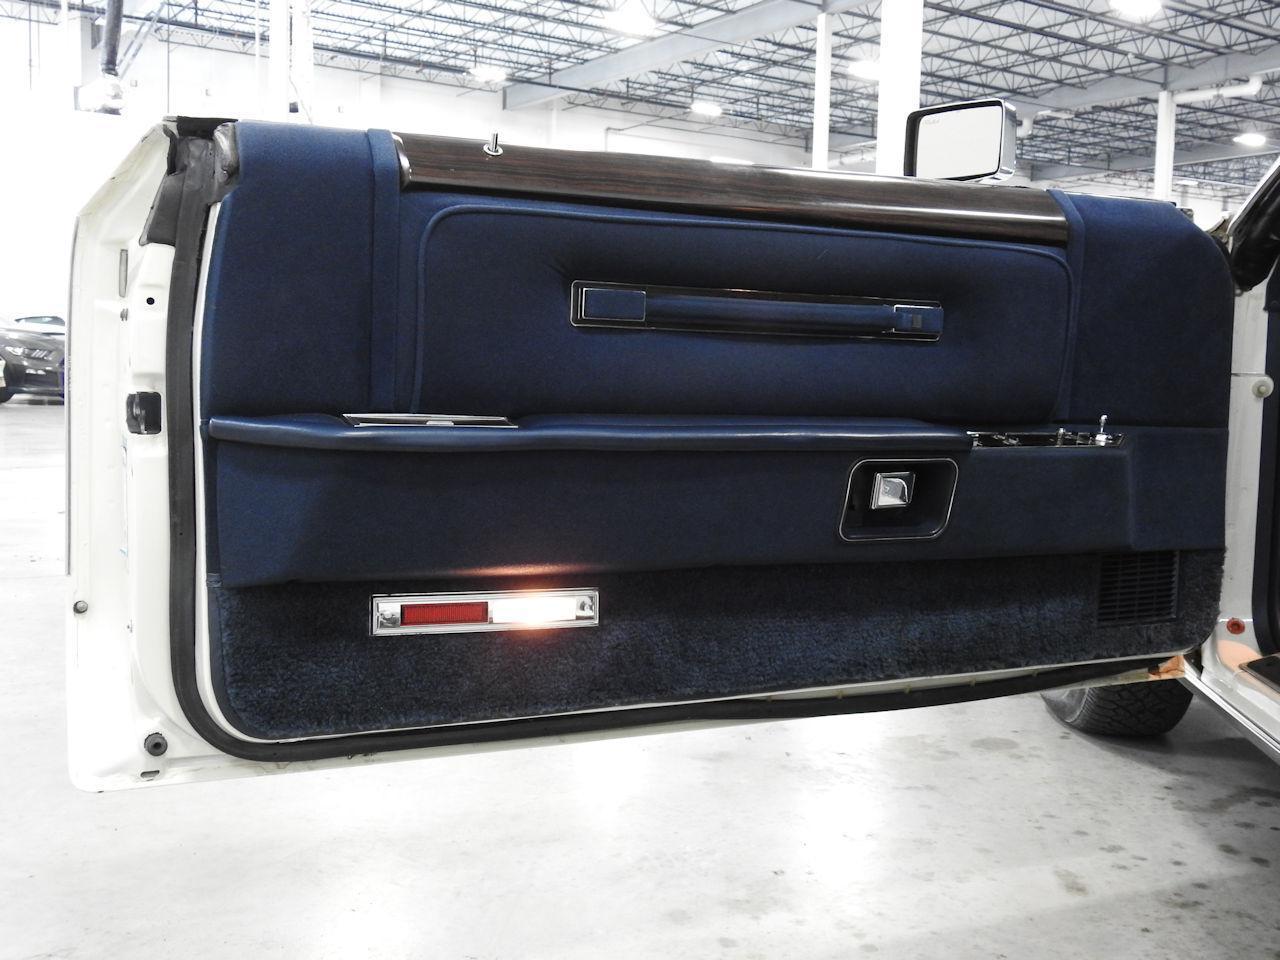 1979 Lincoln MKV 55